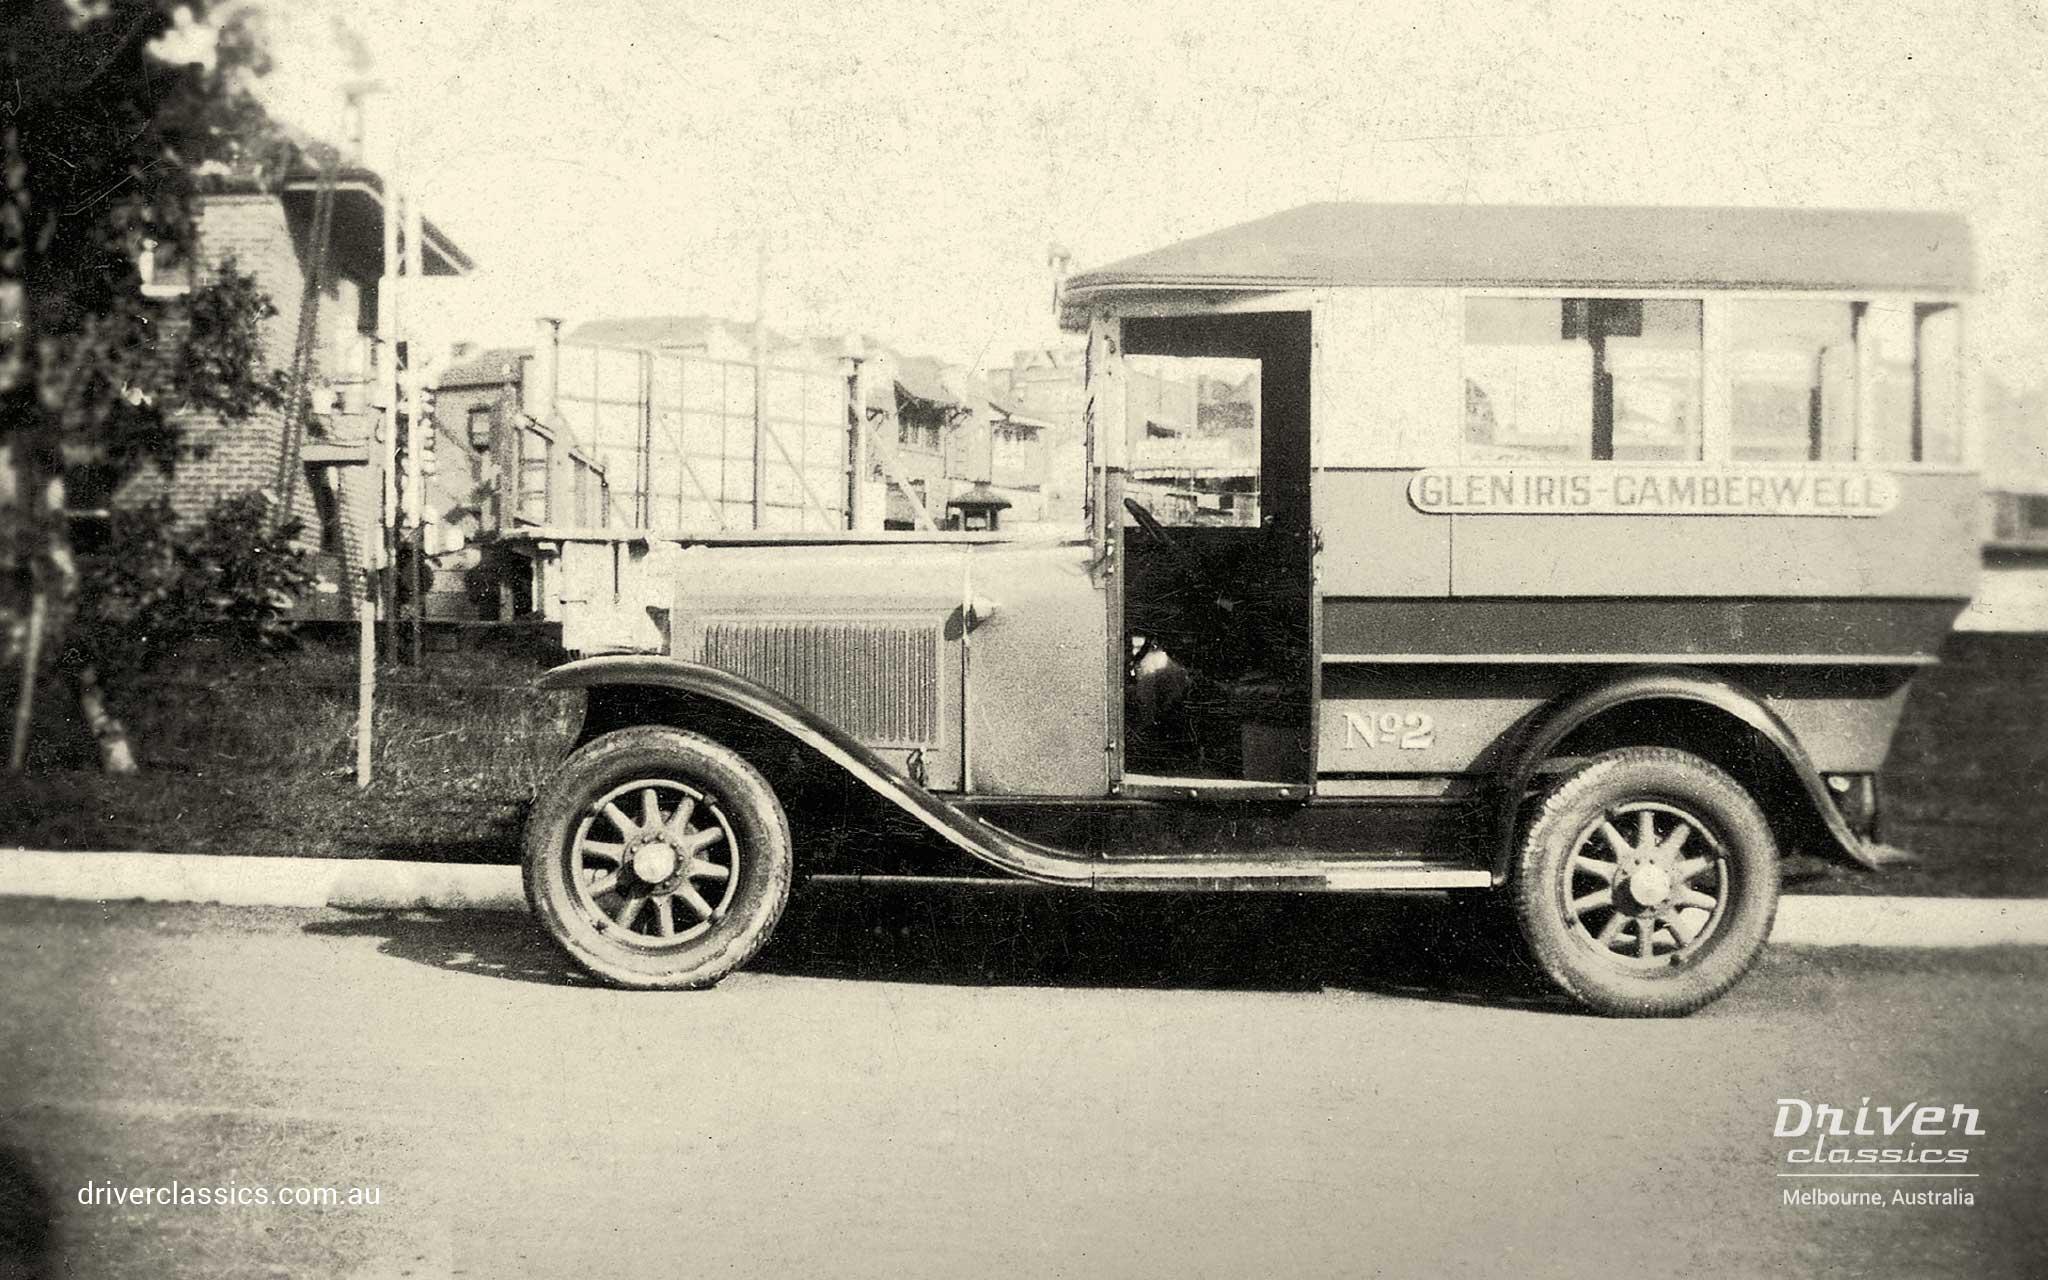 Pontiac 29-6 bus cab. The original Driver Brothers cab #2 at Glen Iris Station, Melbourne VIC, circa early 1930s.